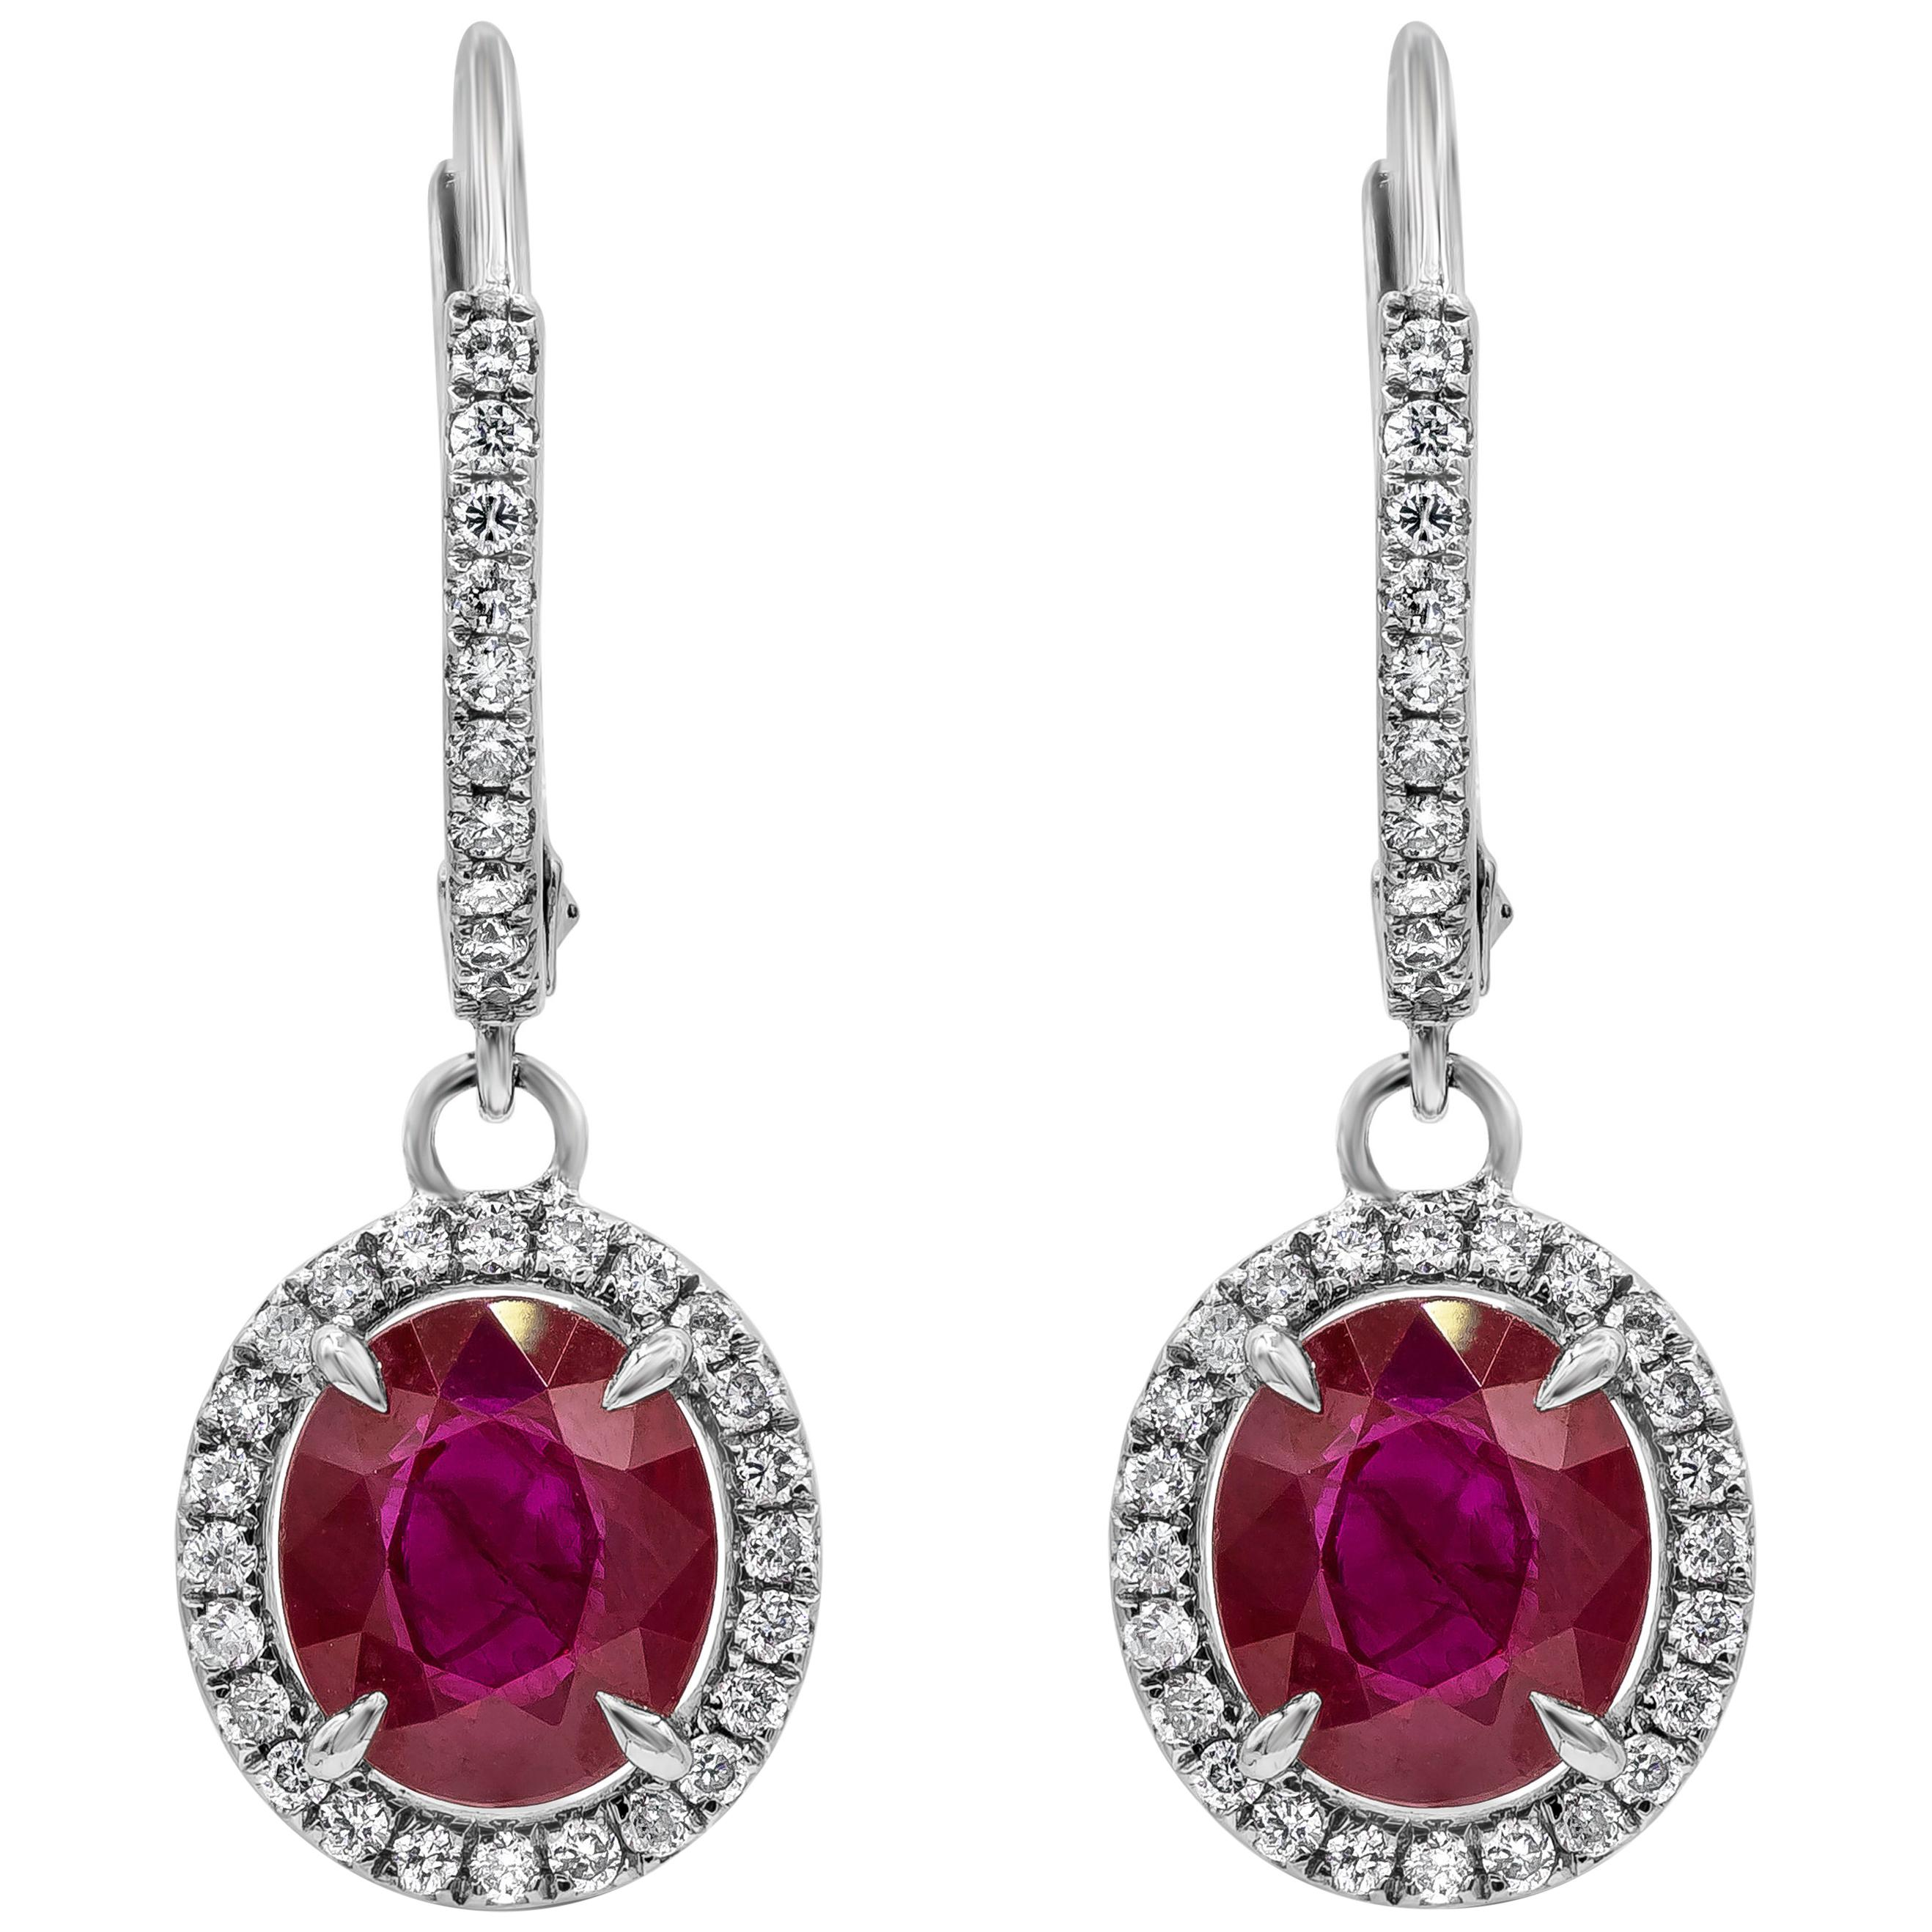 Roman Malakov, Oval Cut Ruby and Diamond Halo Dangle Earrings